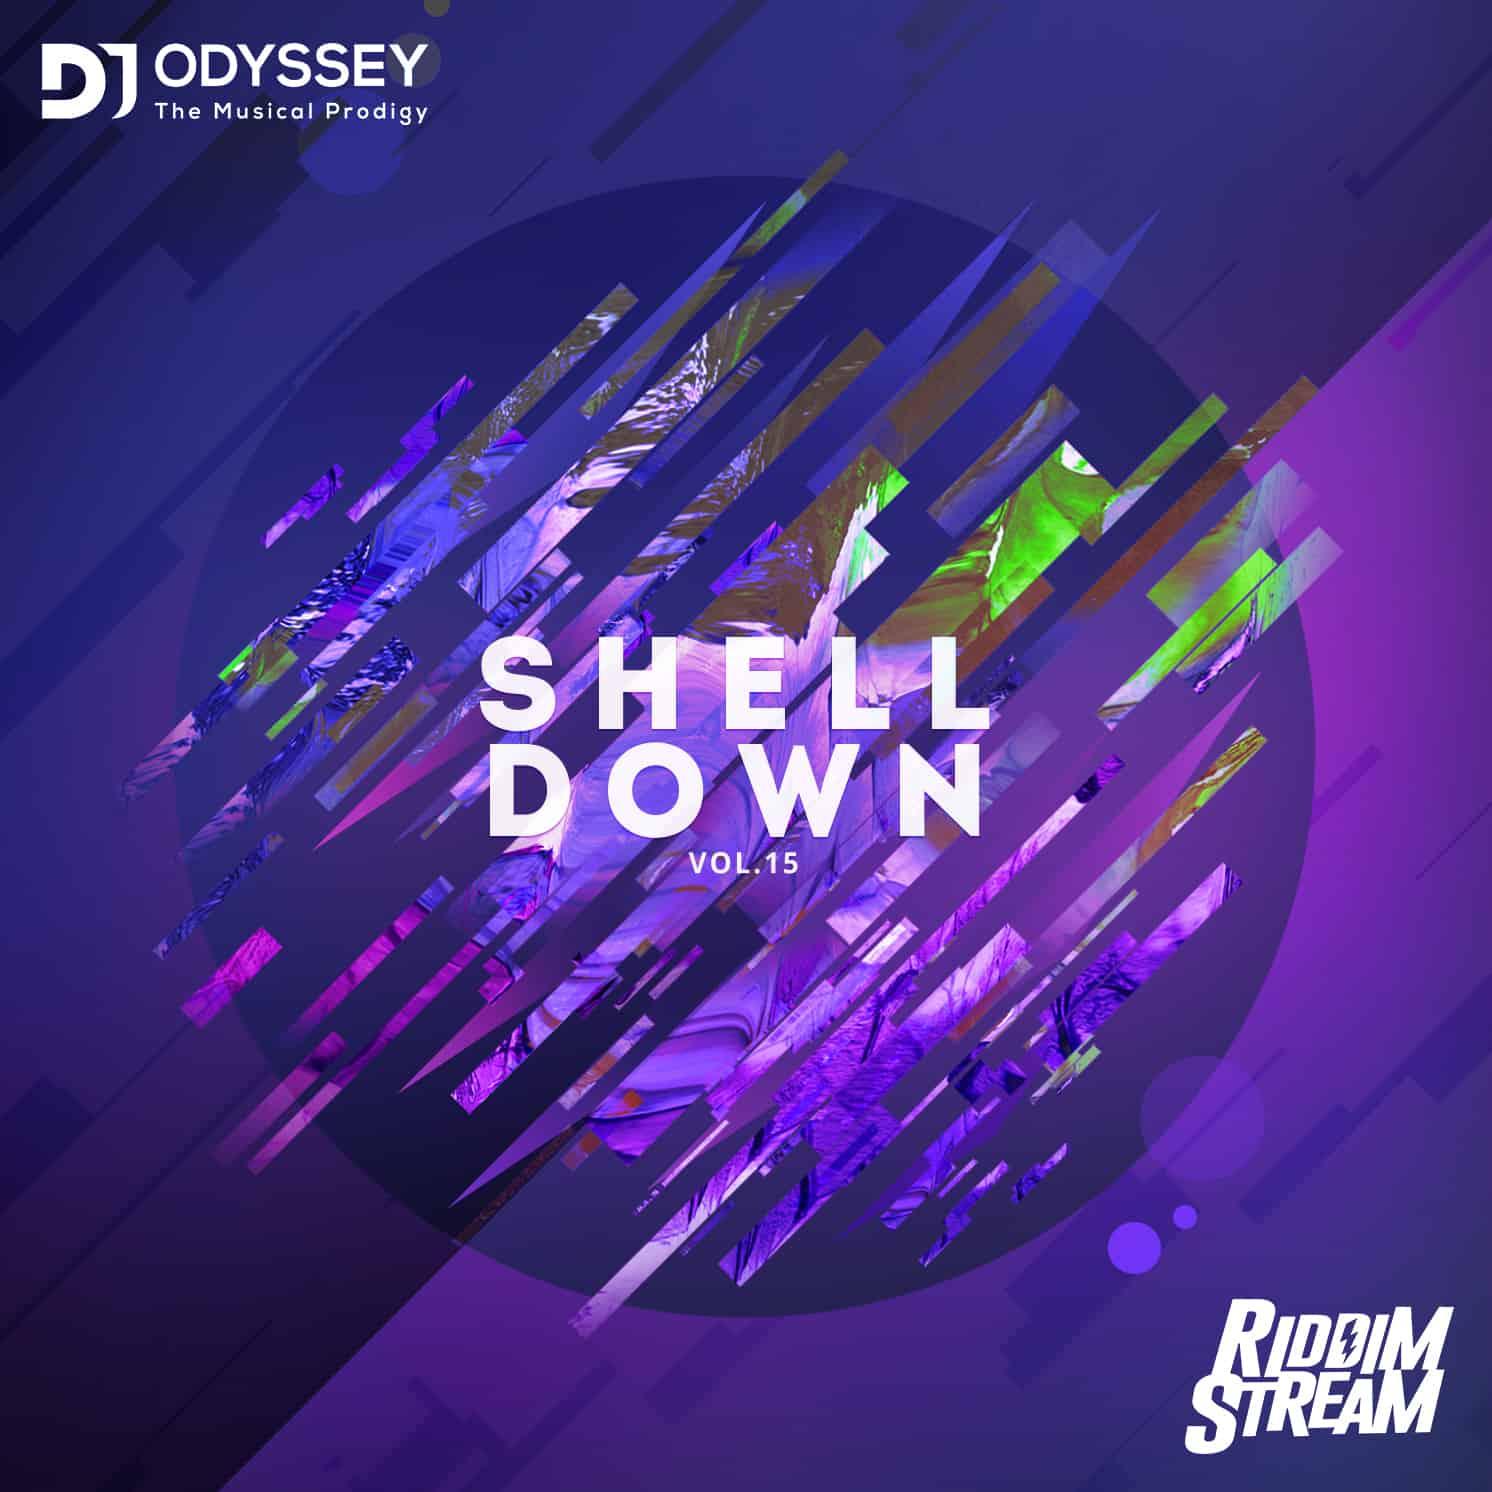 DJ Odyssey - Shell Down Vol. 15